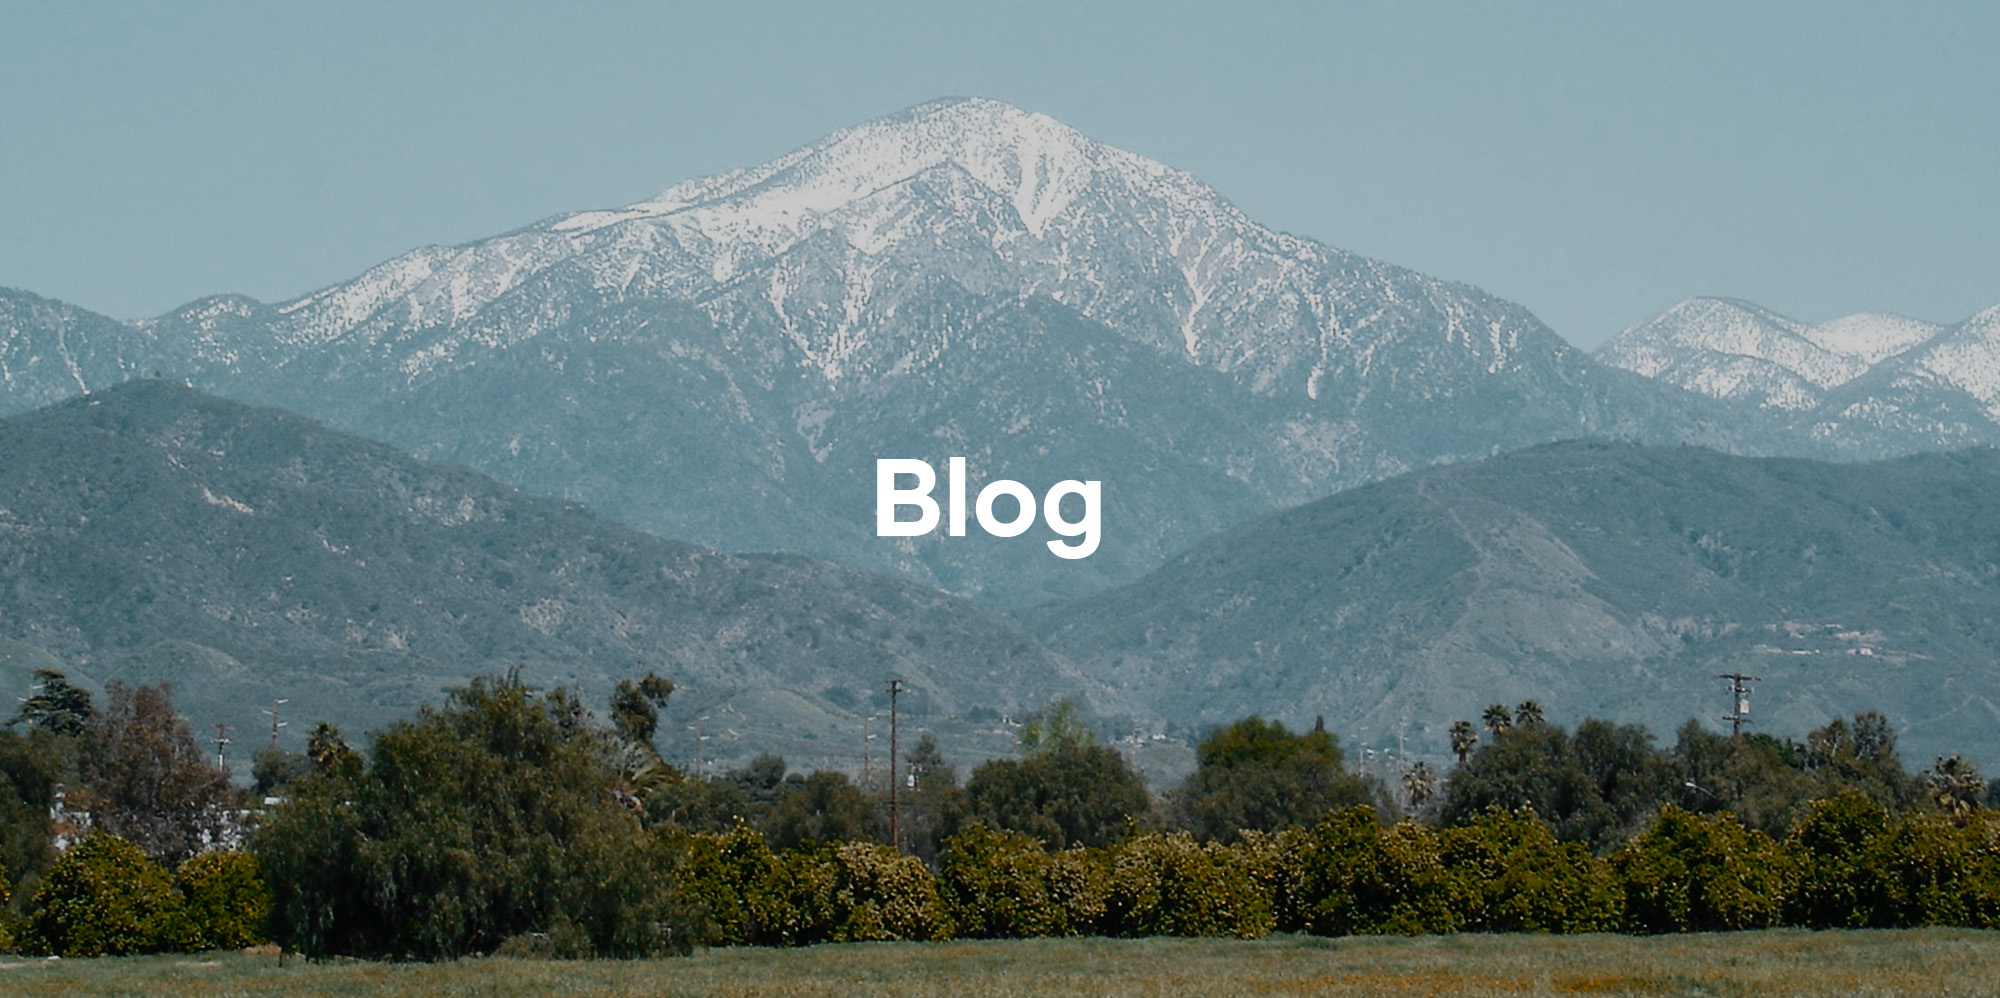 Mountain range title picture entitled Blog